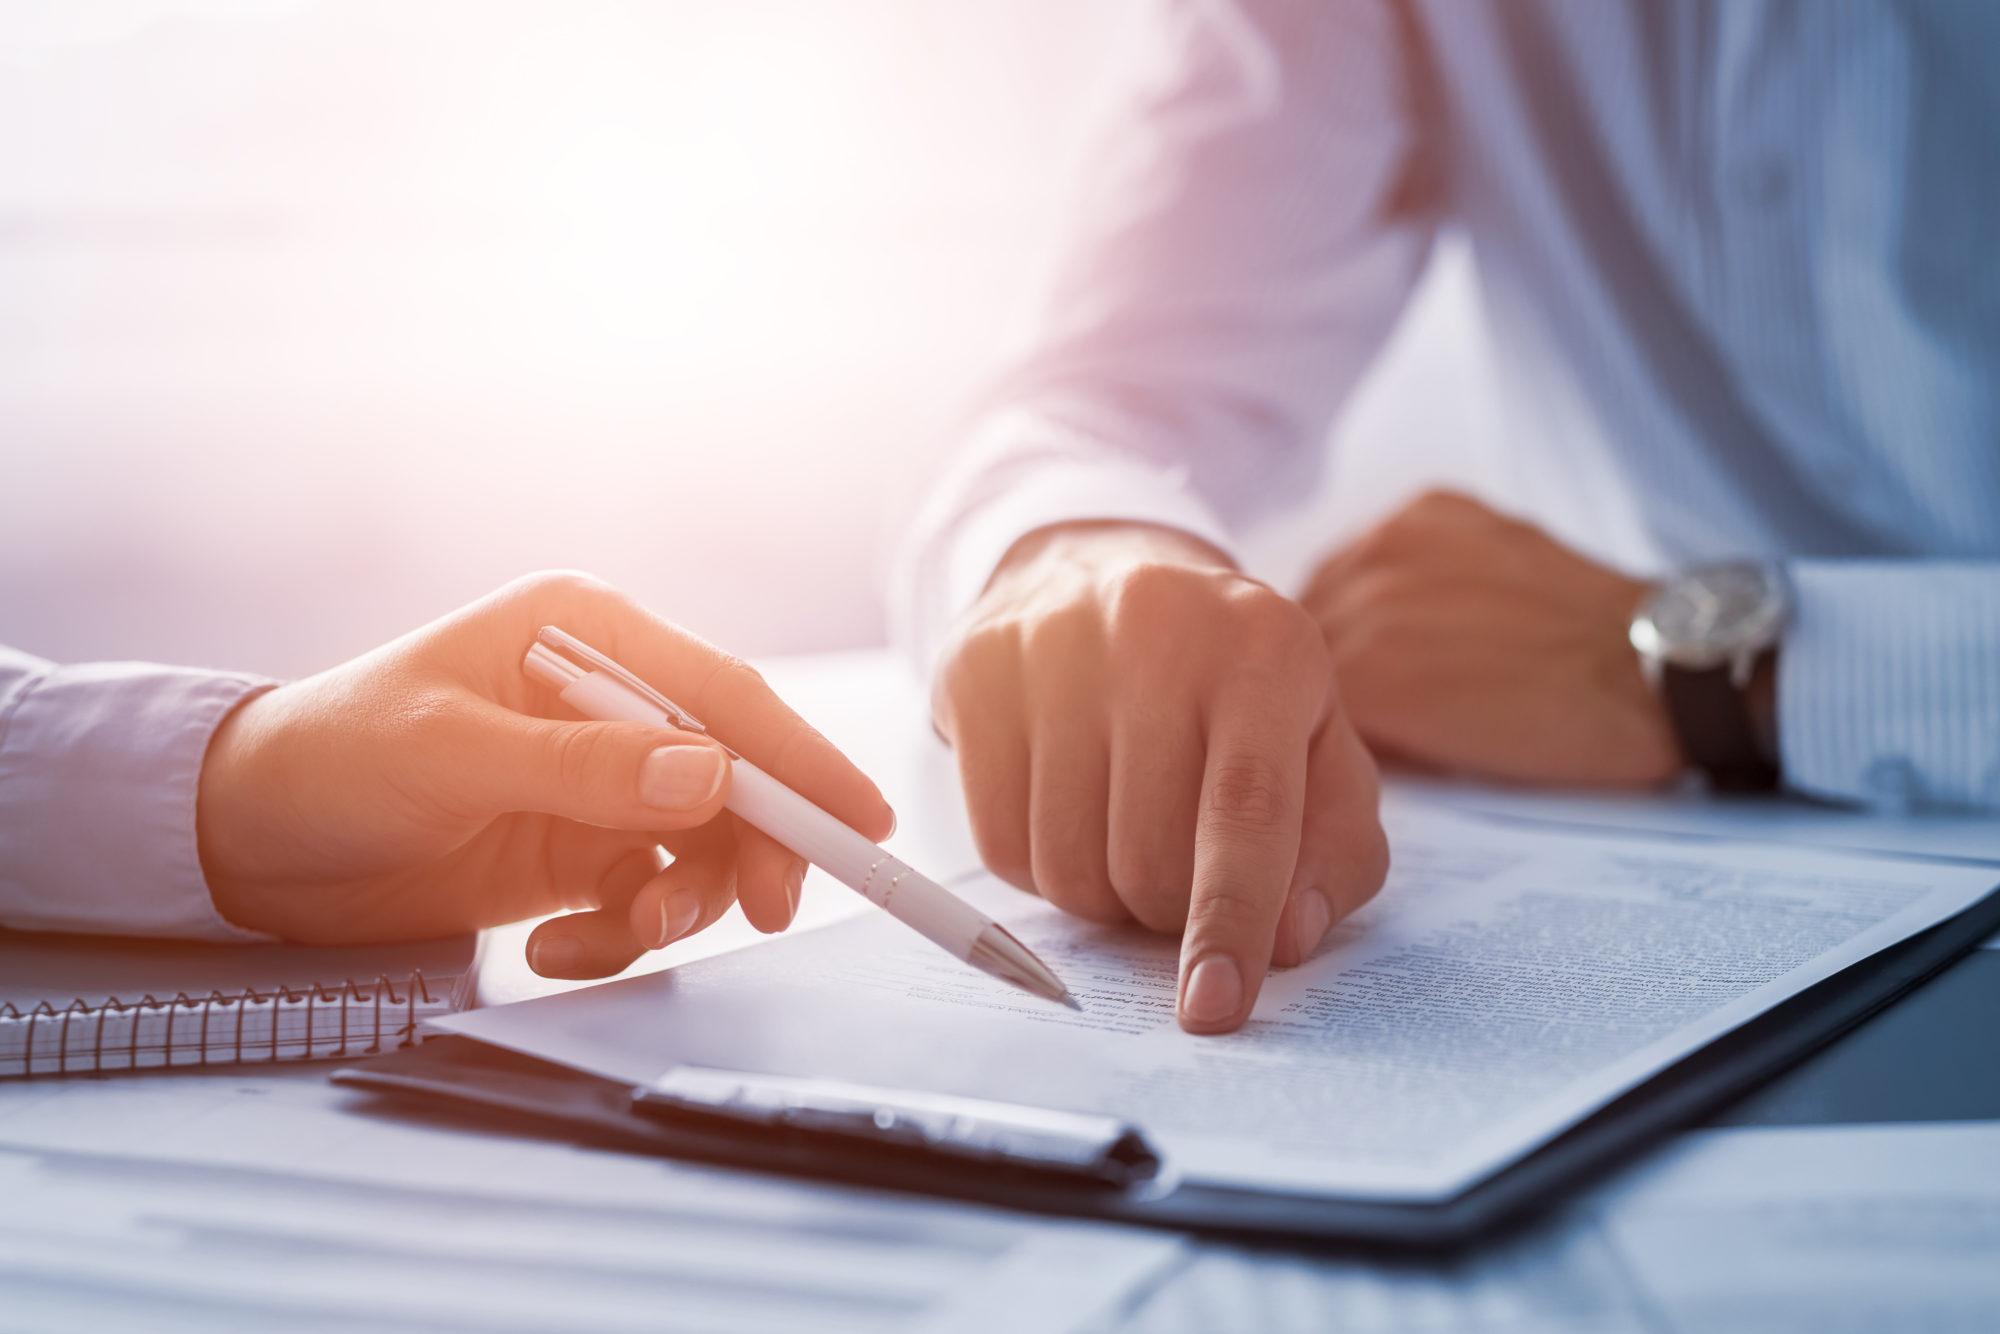 Make It or Break It: Organizing Financial Paperwork for an Advantageous Divorce